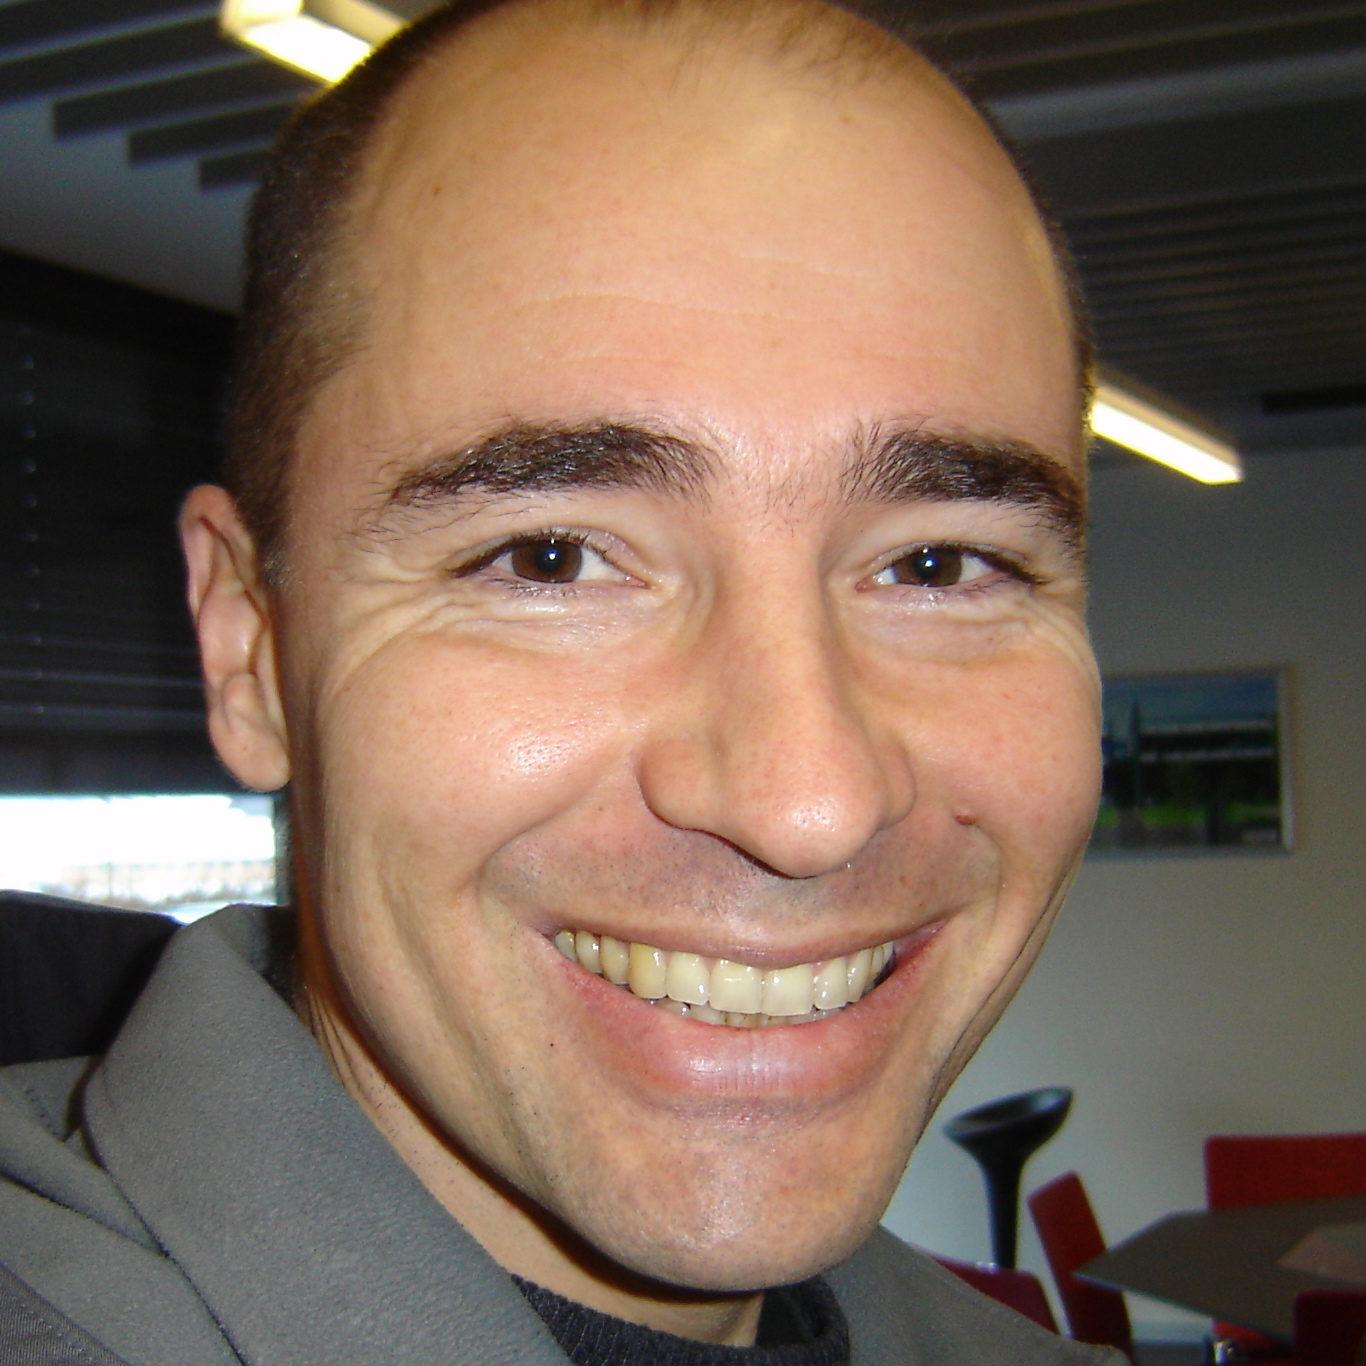 Eric Nidegger